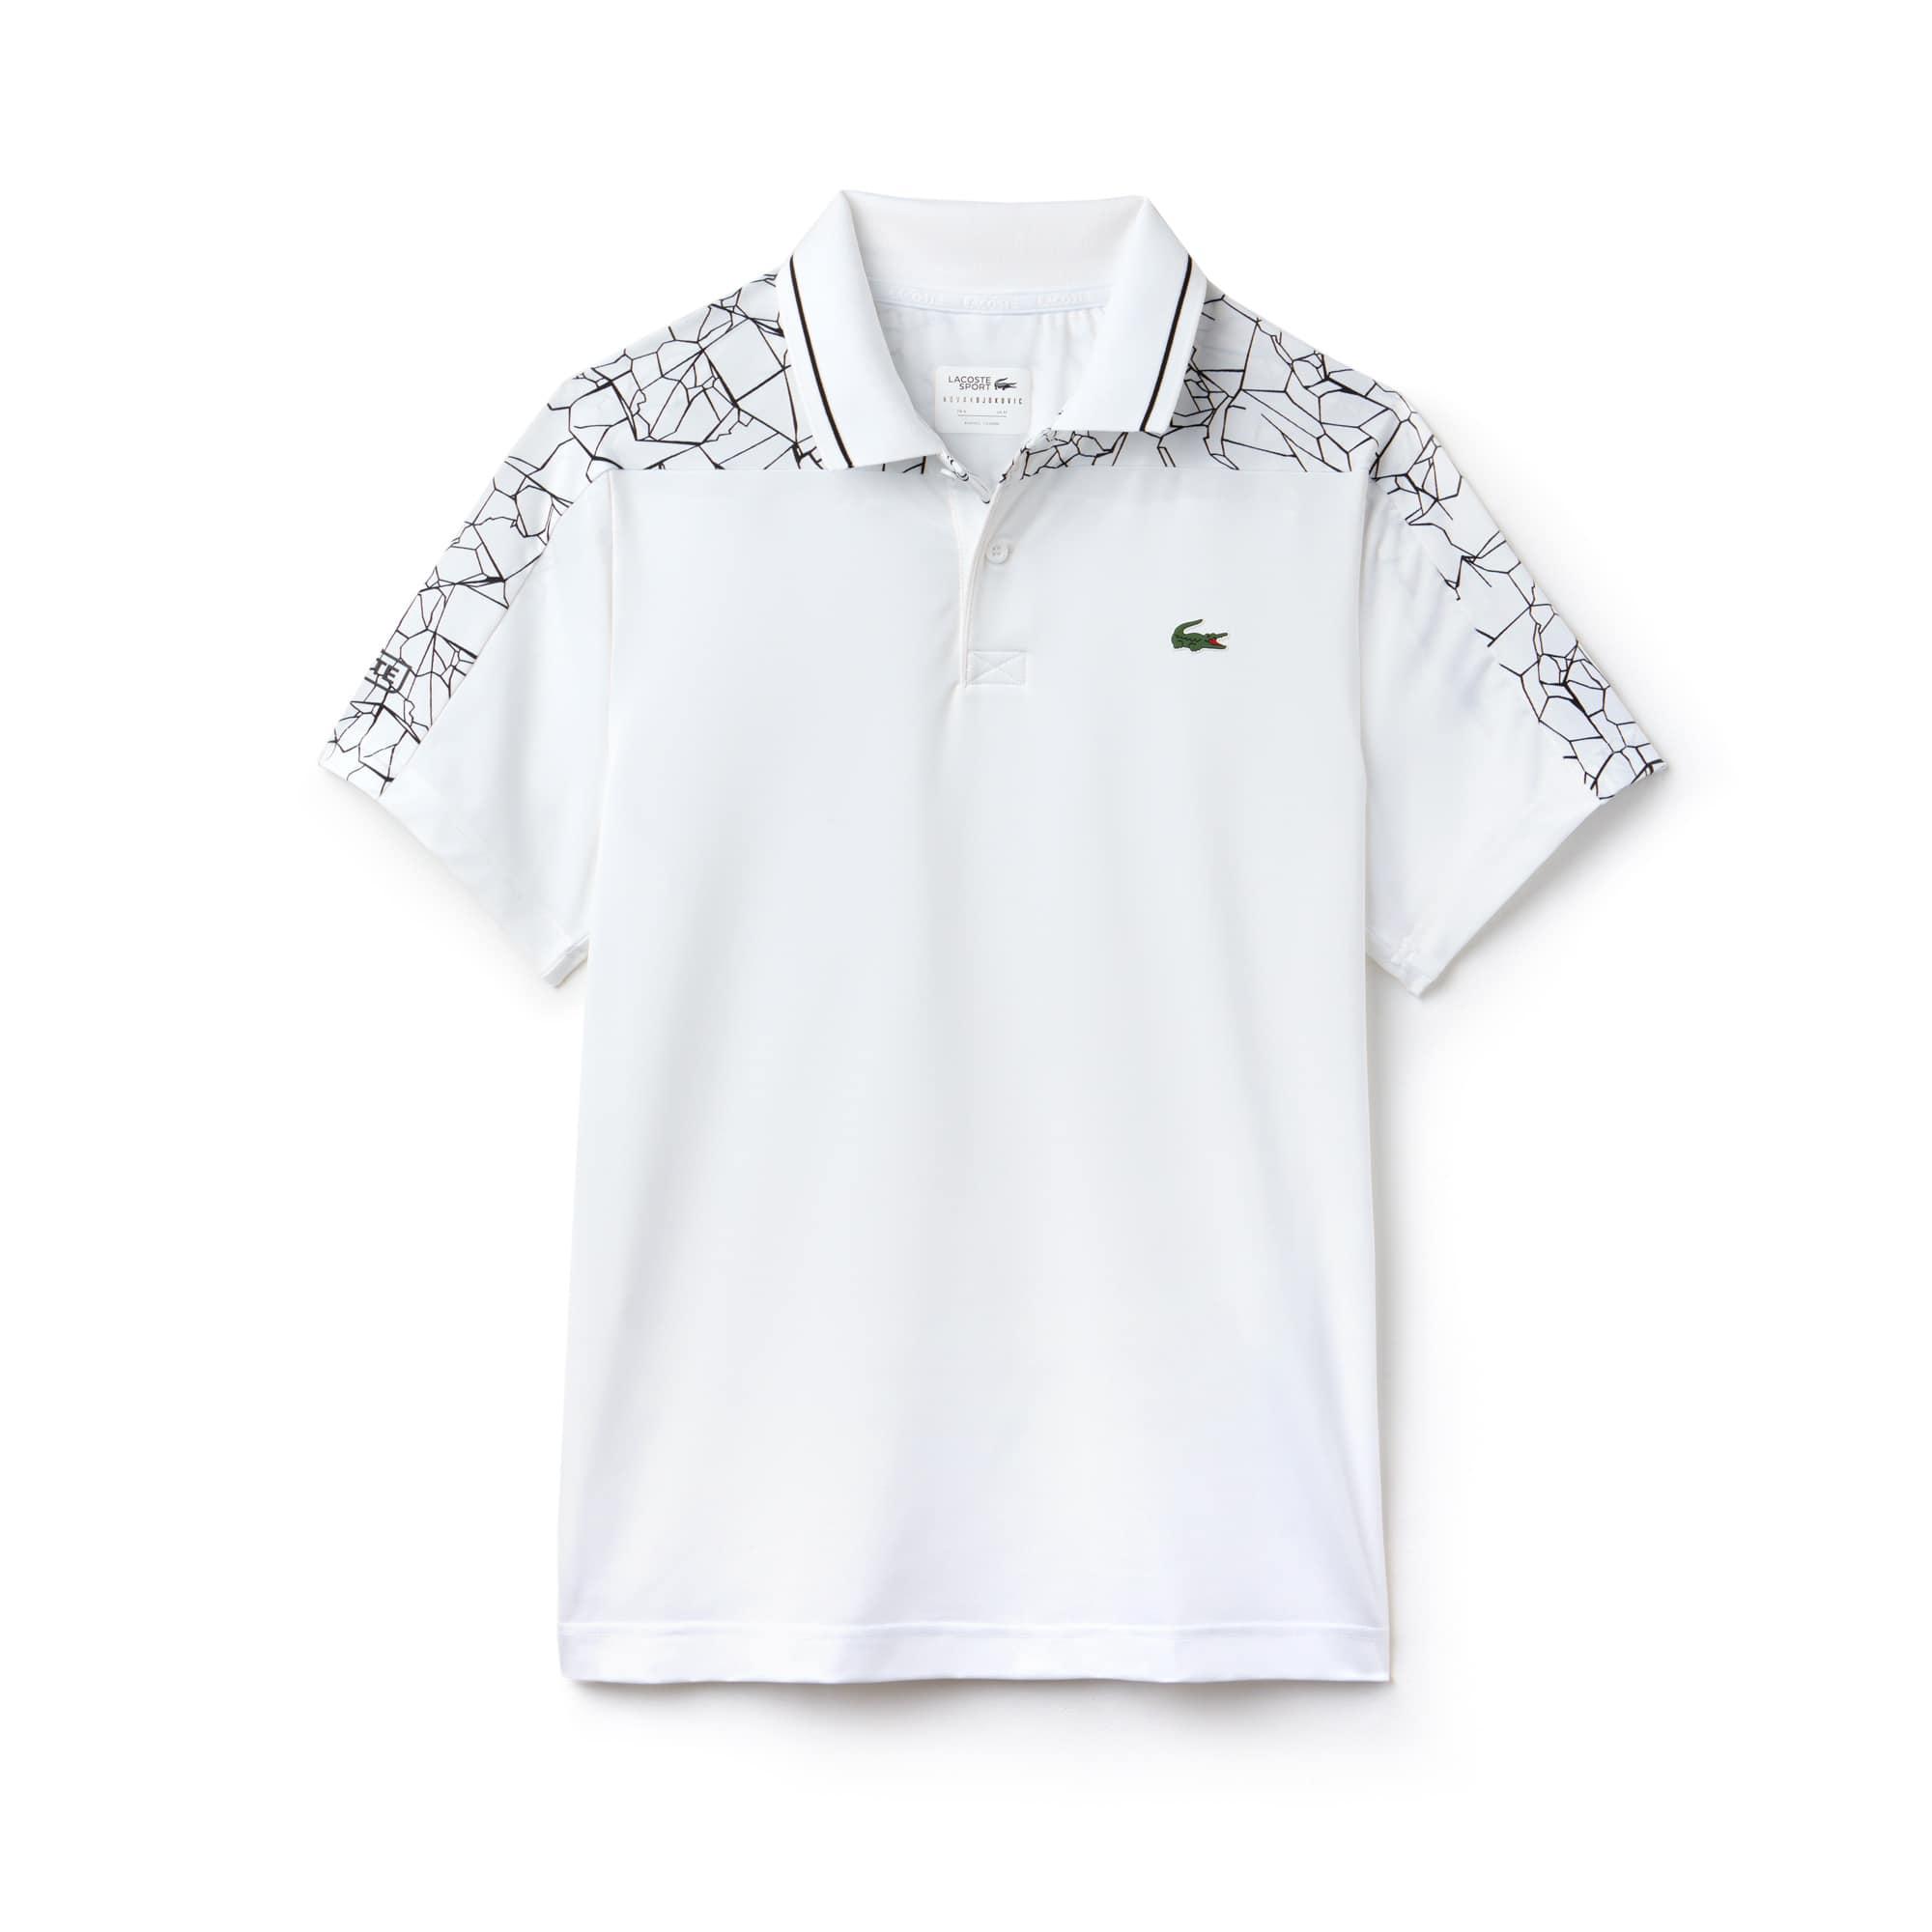 Herren-Poloshirt aus Stretch-Jersey LACOSTE SPORT NOVAK DJOKOVIC